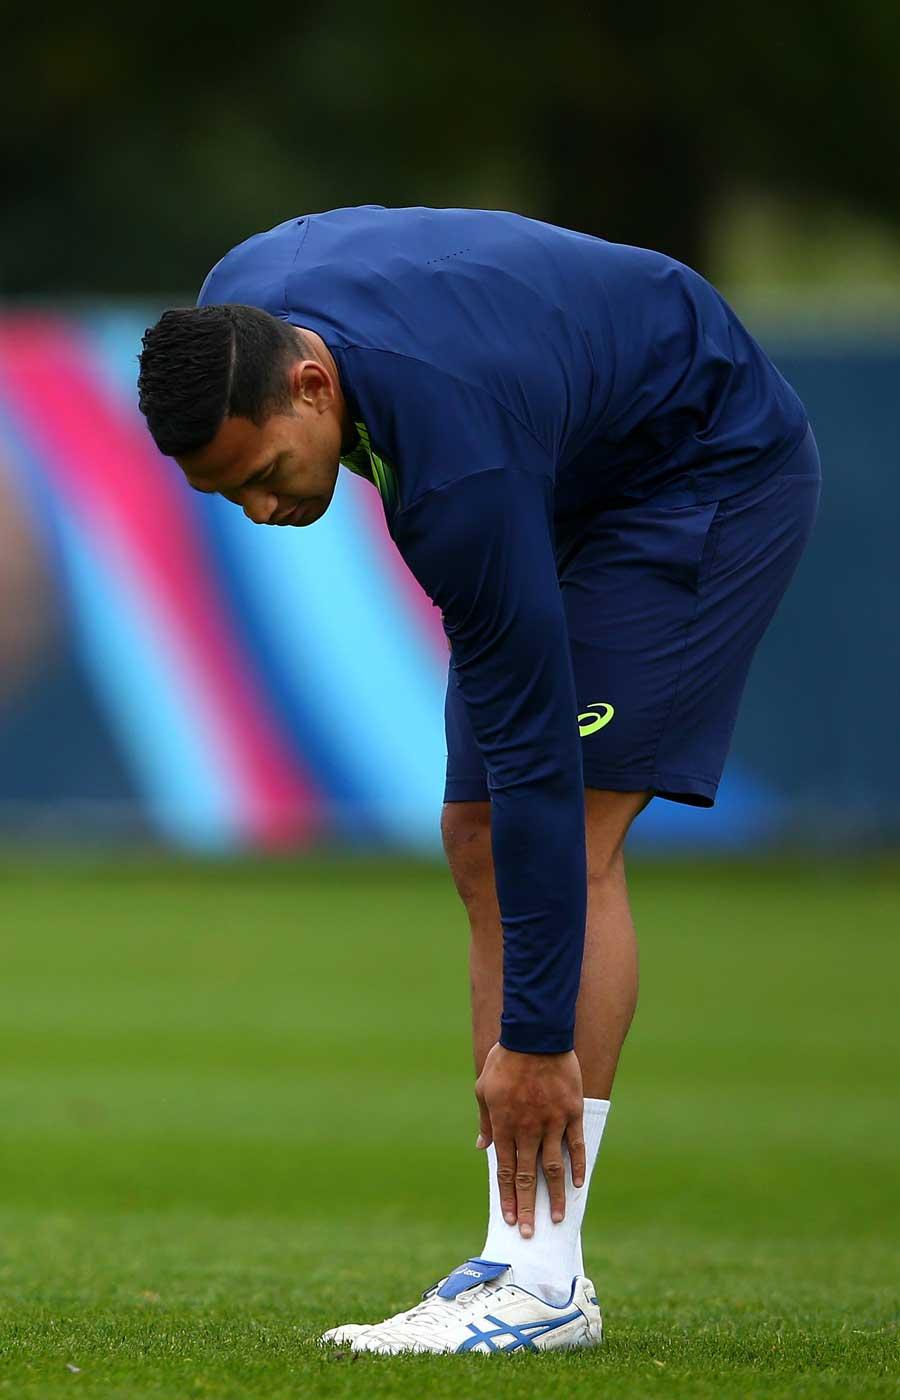 Israel Folau checks his injured ankle